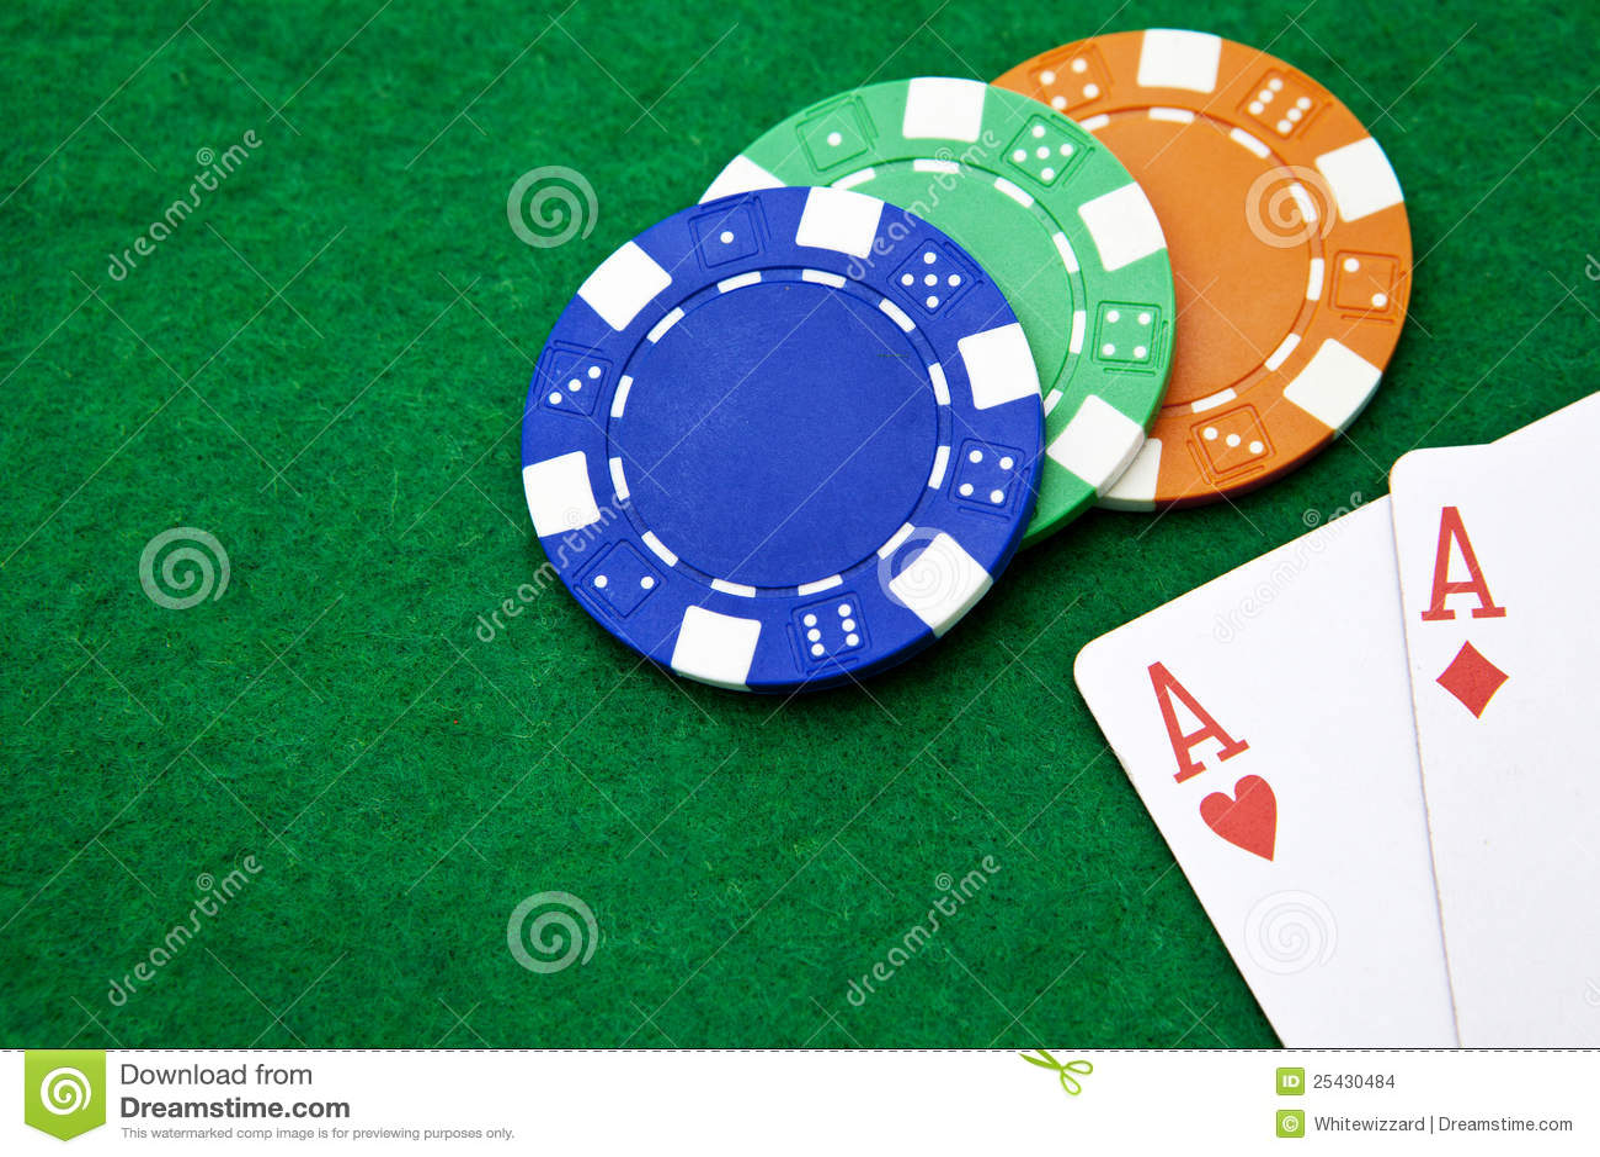 monte casino texas holdem